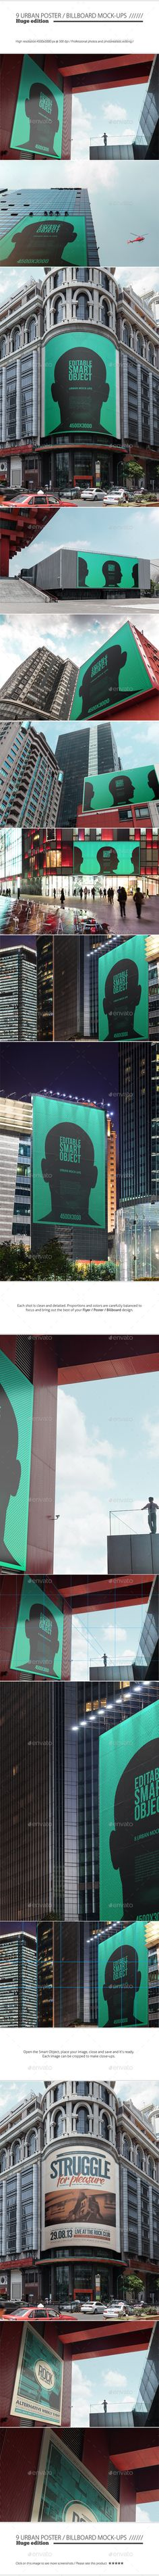 Urban Poster / Billboard Mock-ups - Huge Edition | #urbanpostermockup #billboardmockup #mockups | Download: http://graphicriver.net/item/urban-poster-billboard-mockups-huge-edition/8958149?ref=ksioks